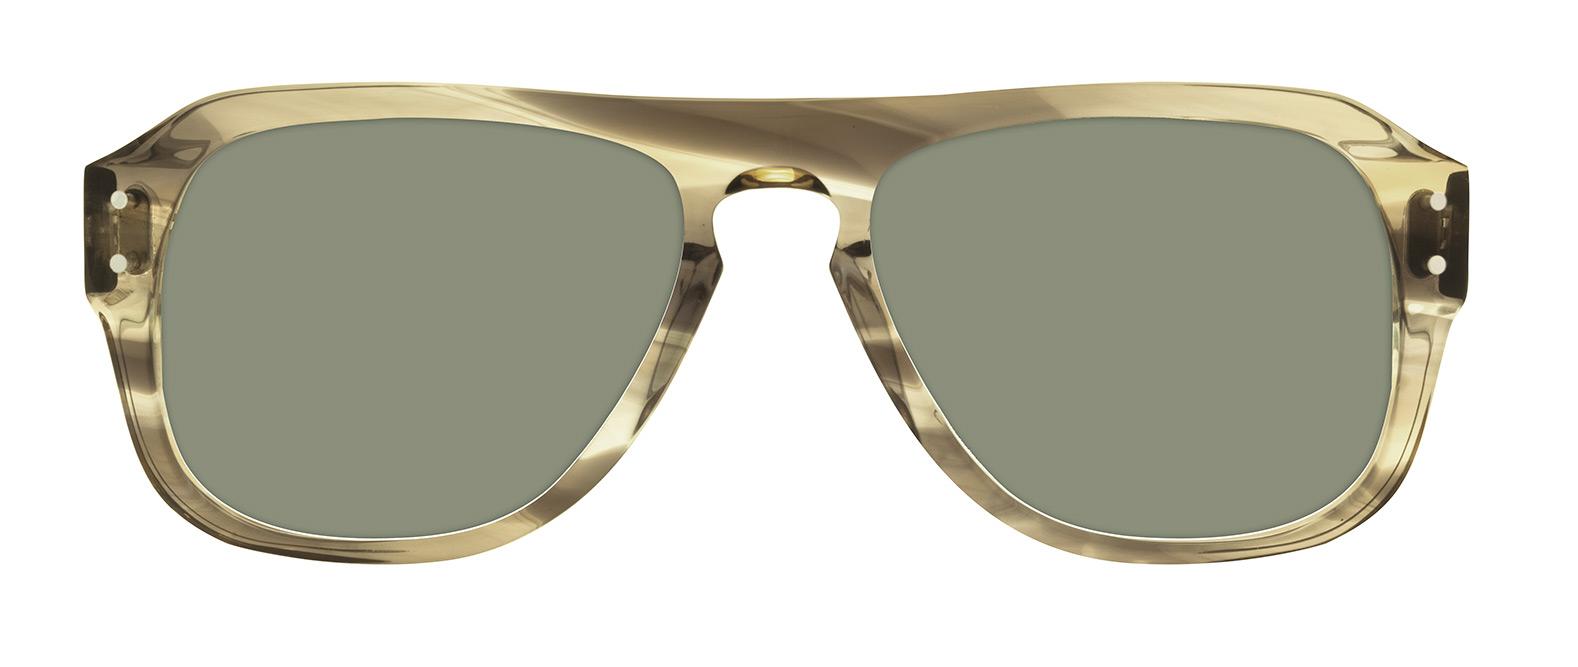 moscot-eyewear-ss2013-31